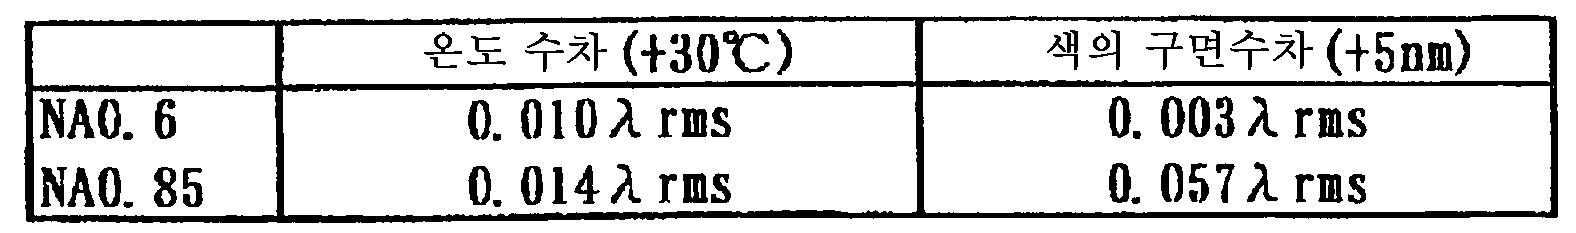 Figure 112005009991906-pct00005